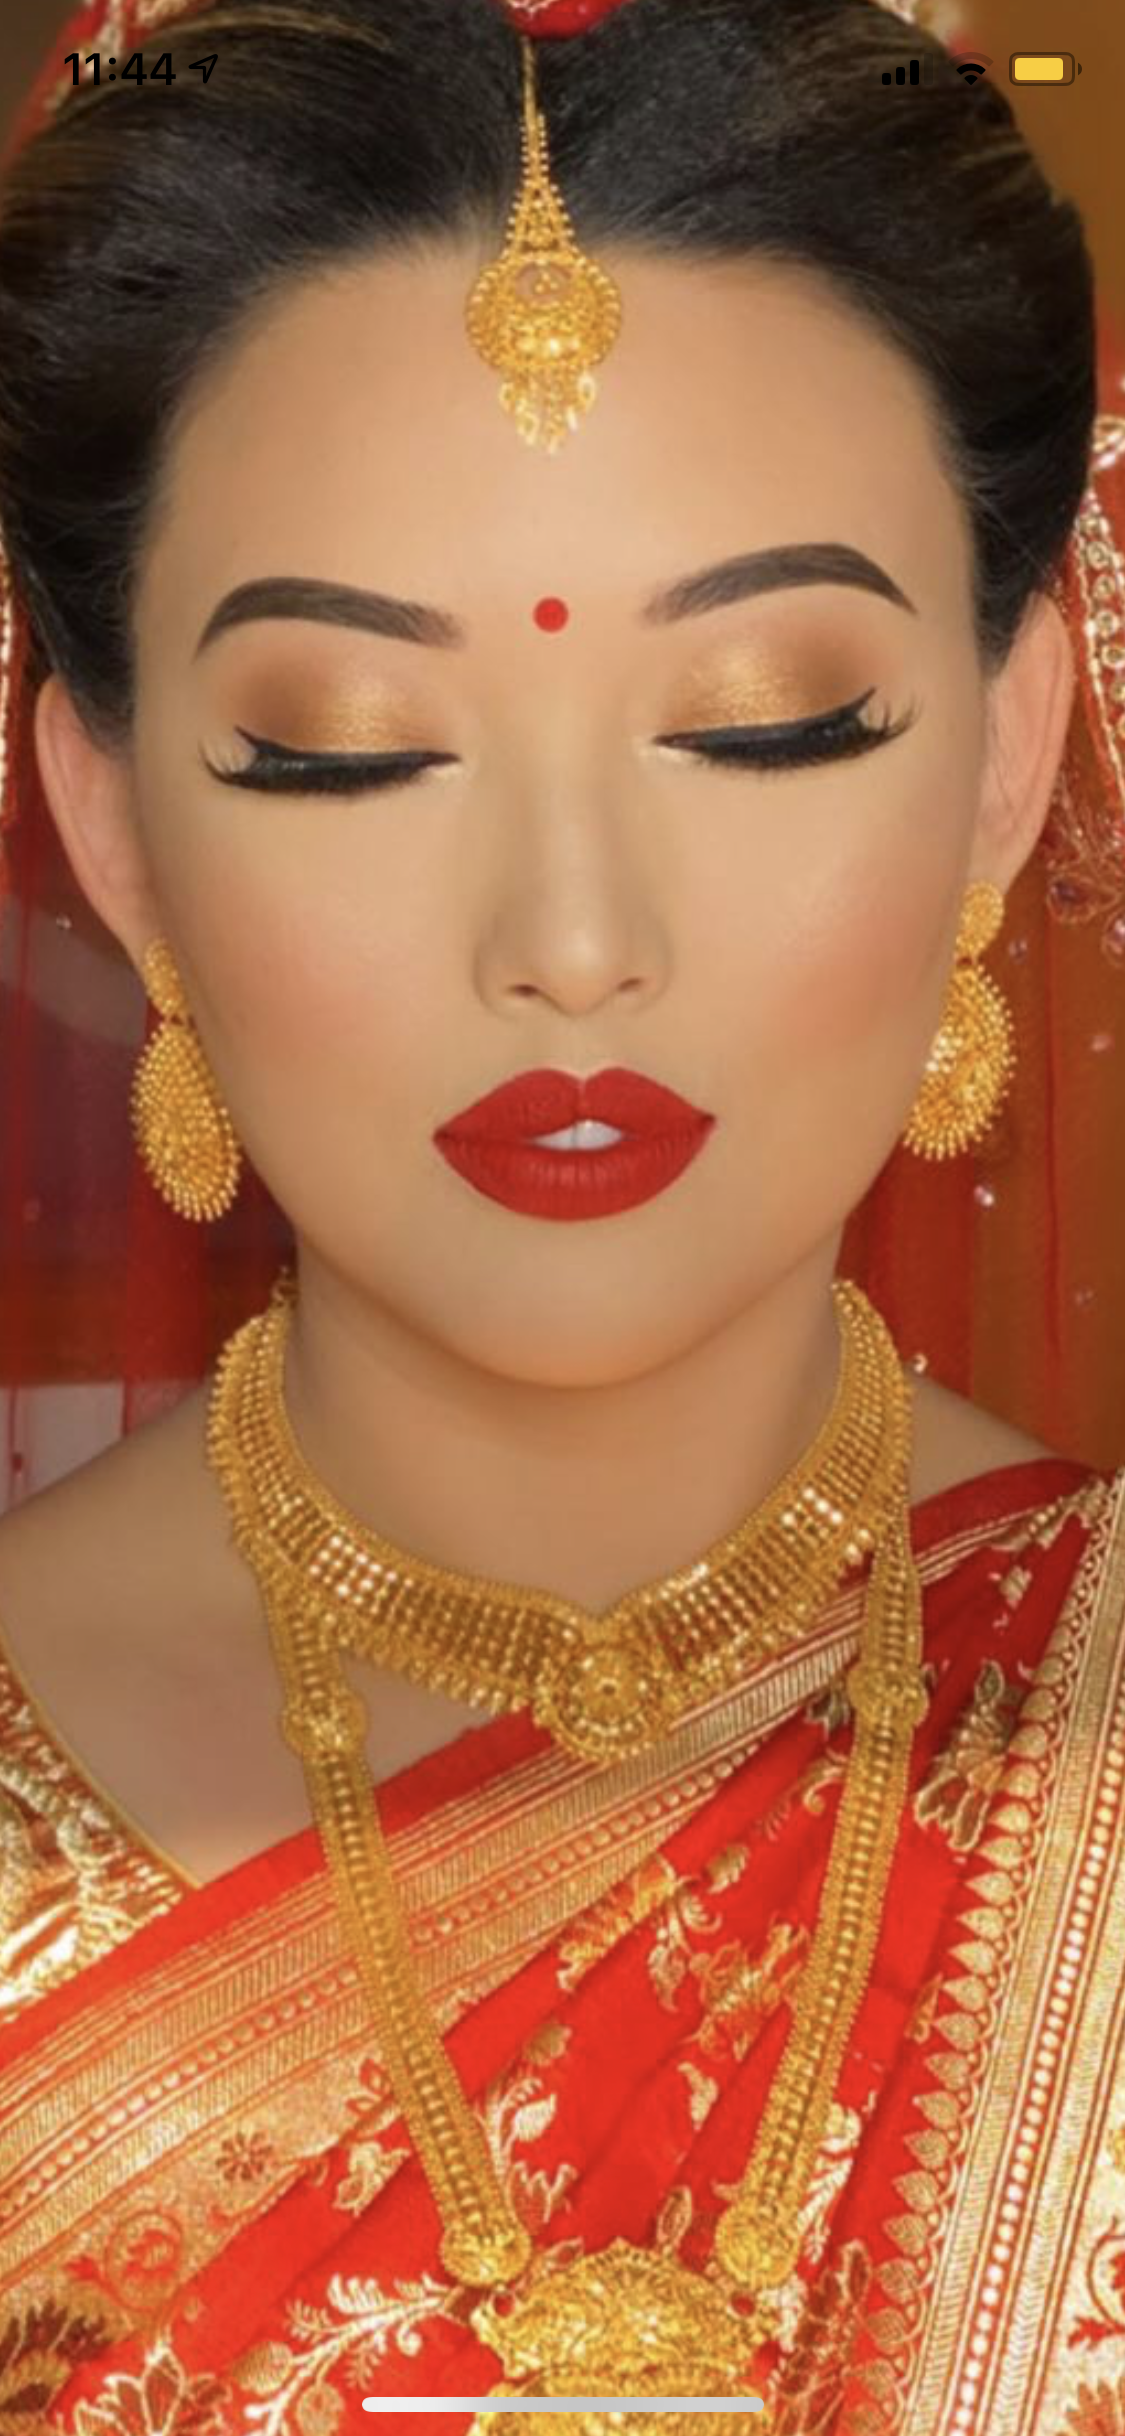 Nepali Bride Indian Bride Makeup South Asian Wedding Makeup Indian Bride Hairstyle